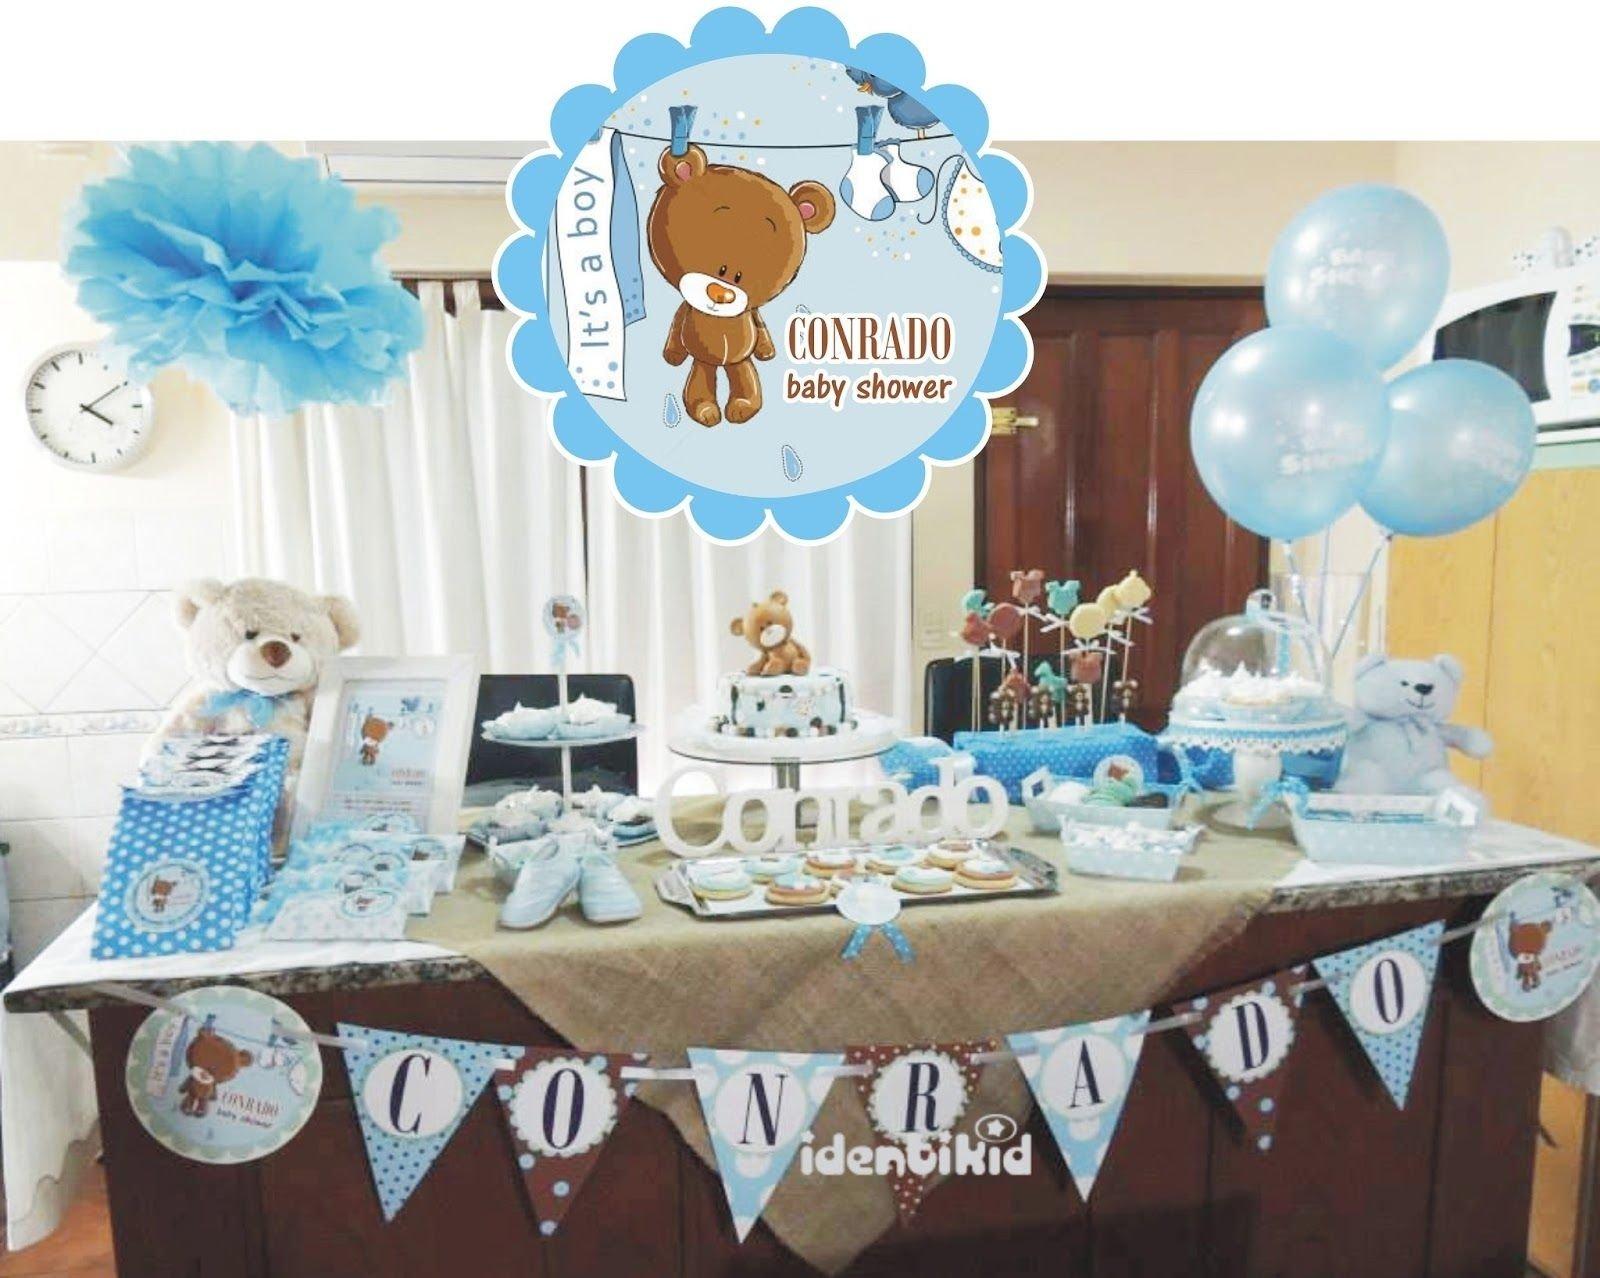 10 Fantastic Teddy Bear Baby Shower Ideas identikid diseno grafico para eventos baby shower banderin 2021